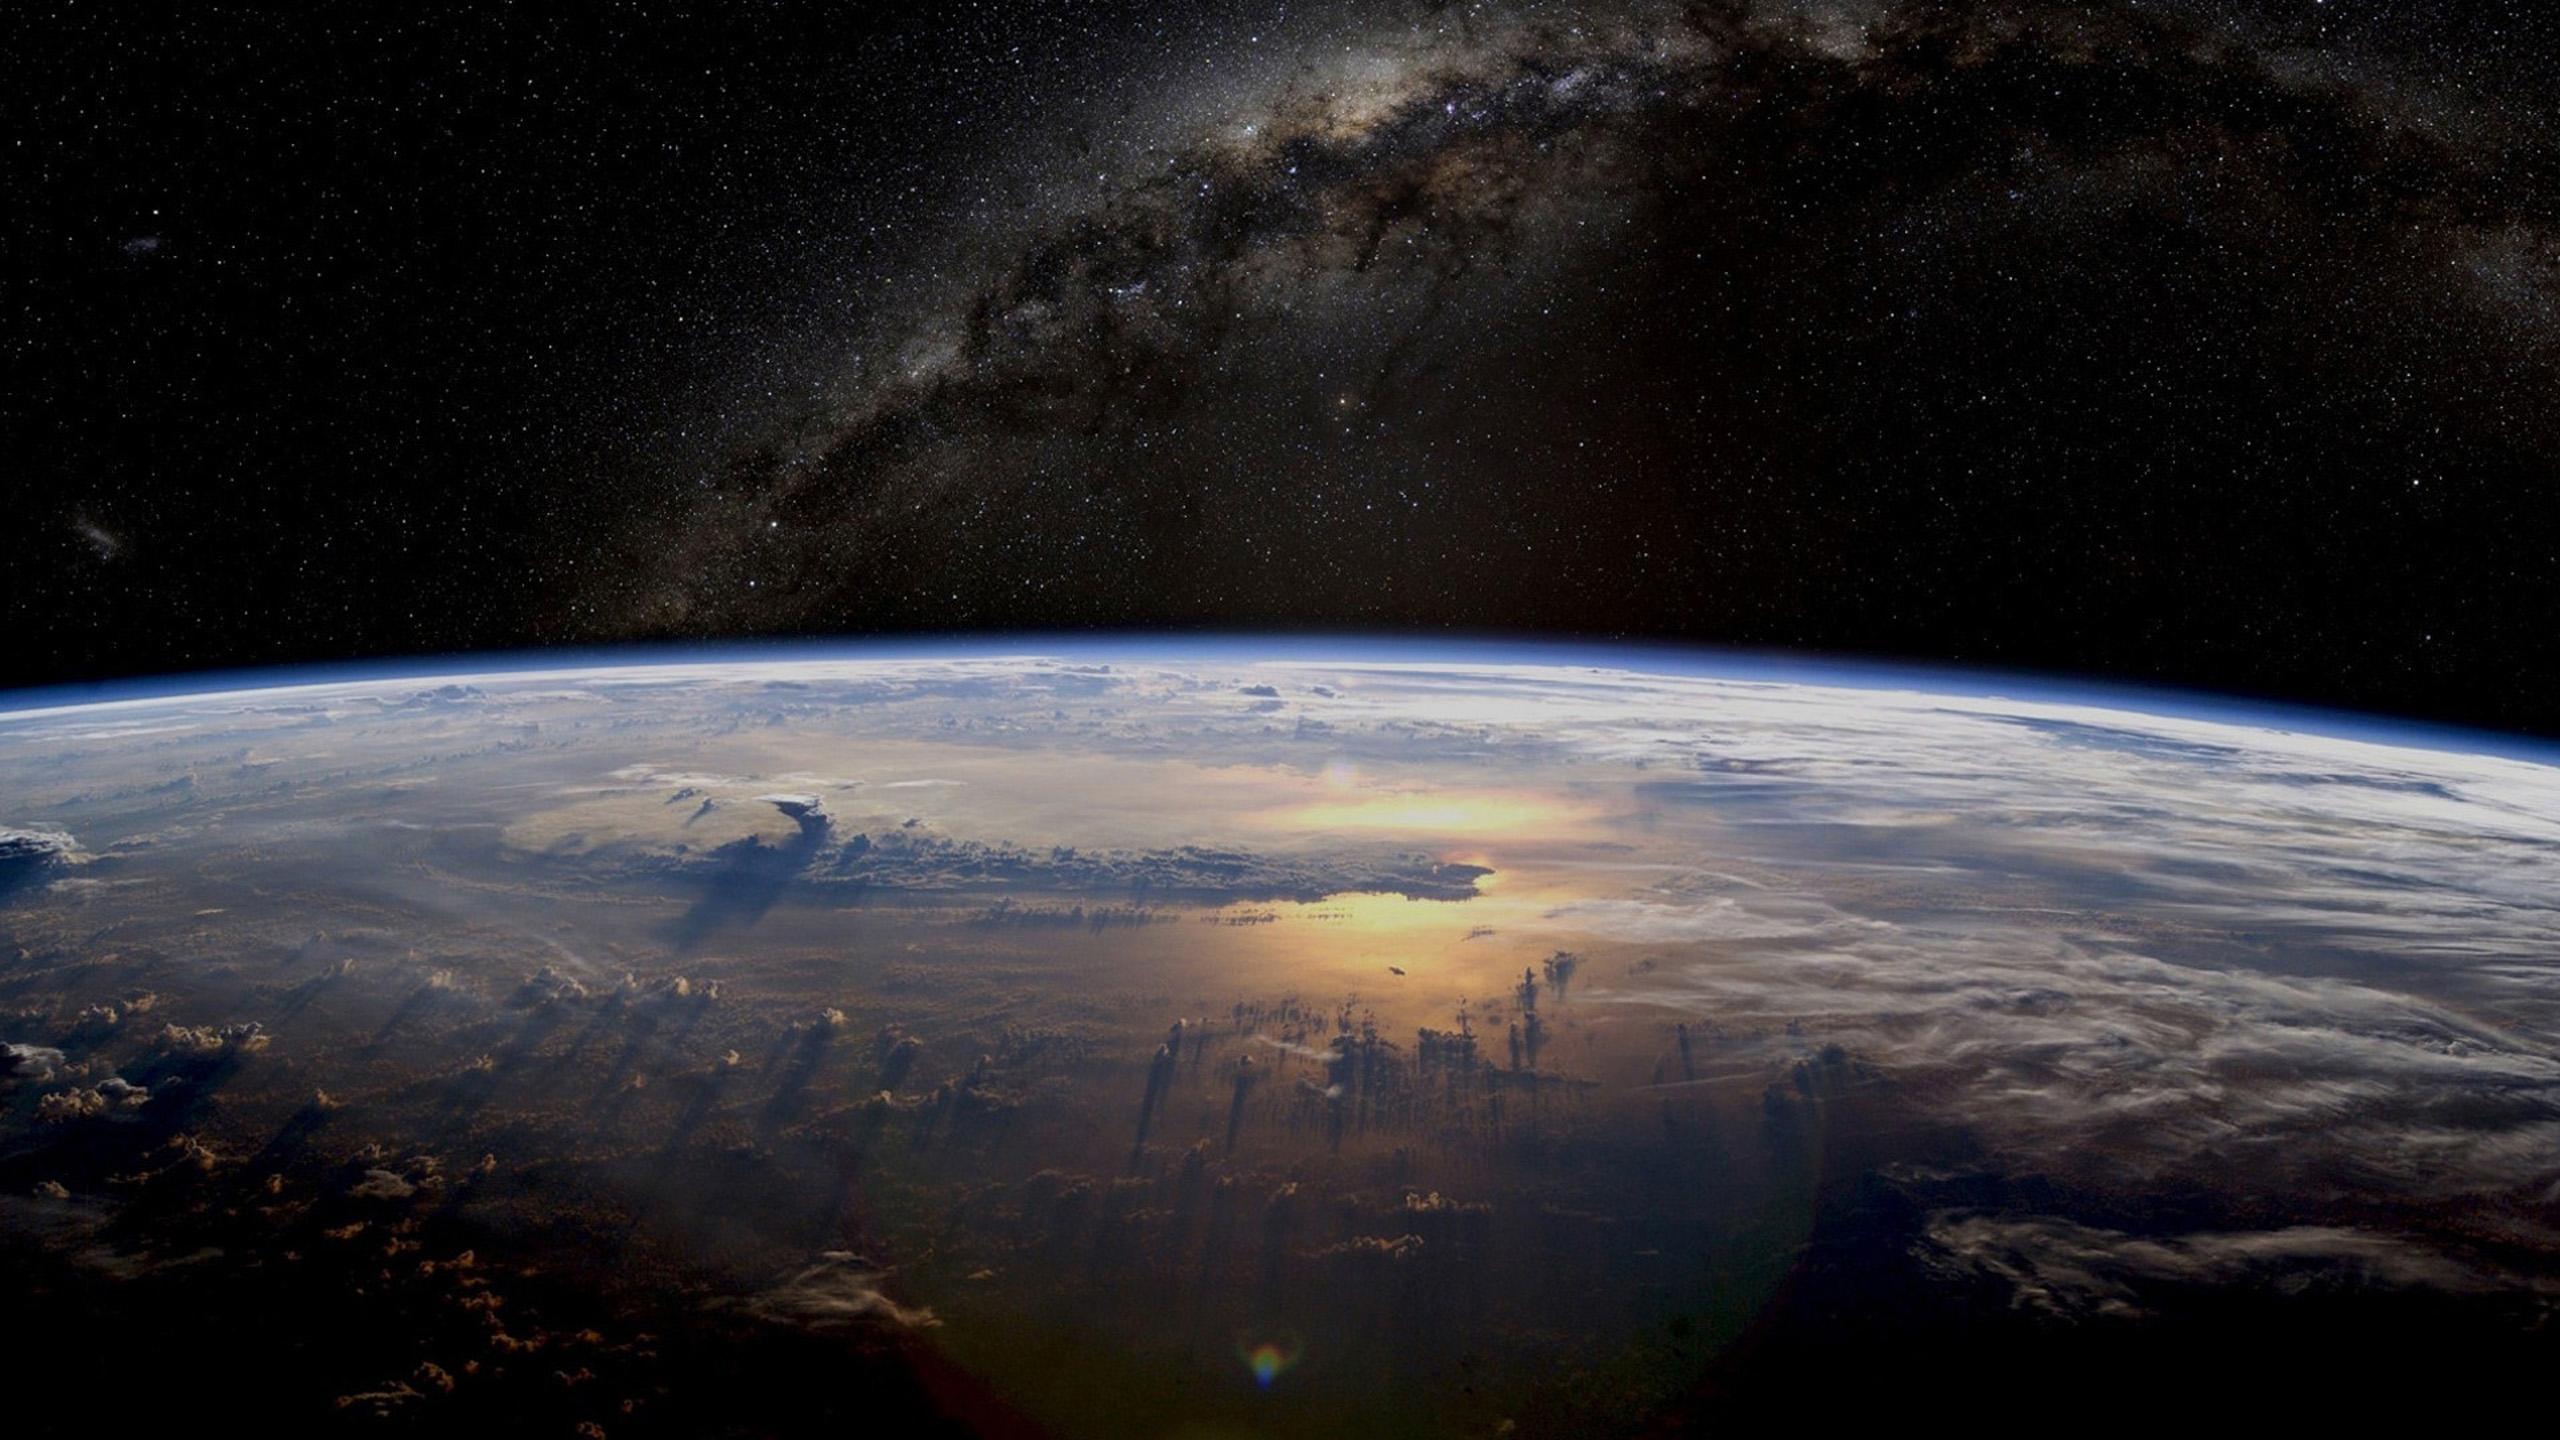 Nasa space hd wallpaper 2560x1440 internet vibes - Space 2560 x 1440 ...